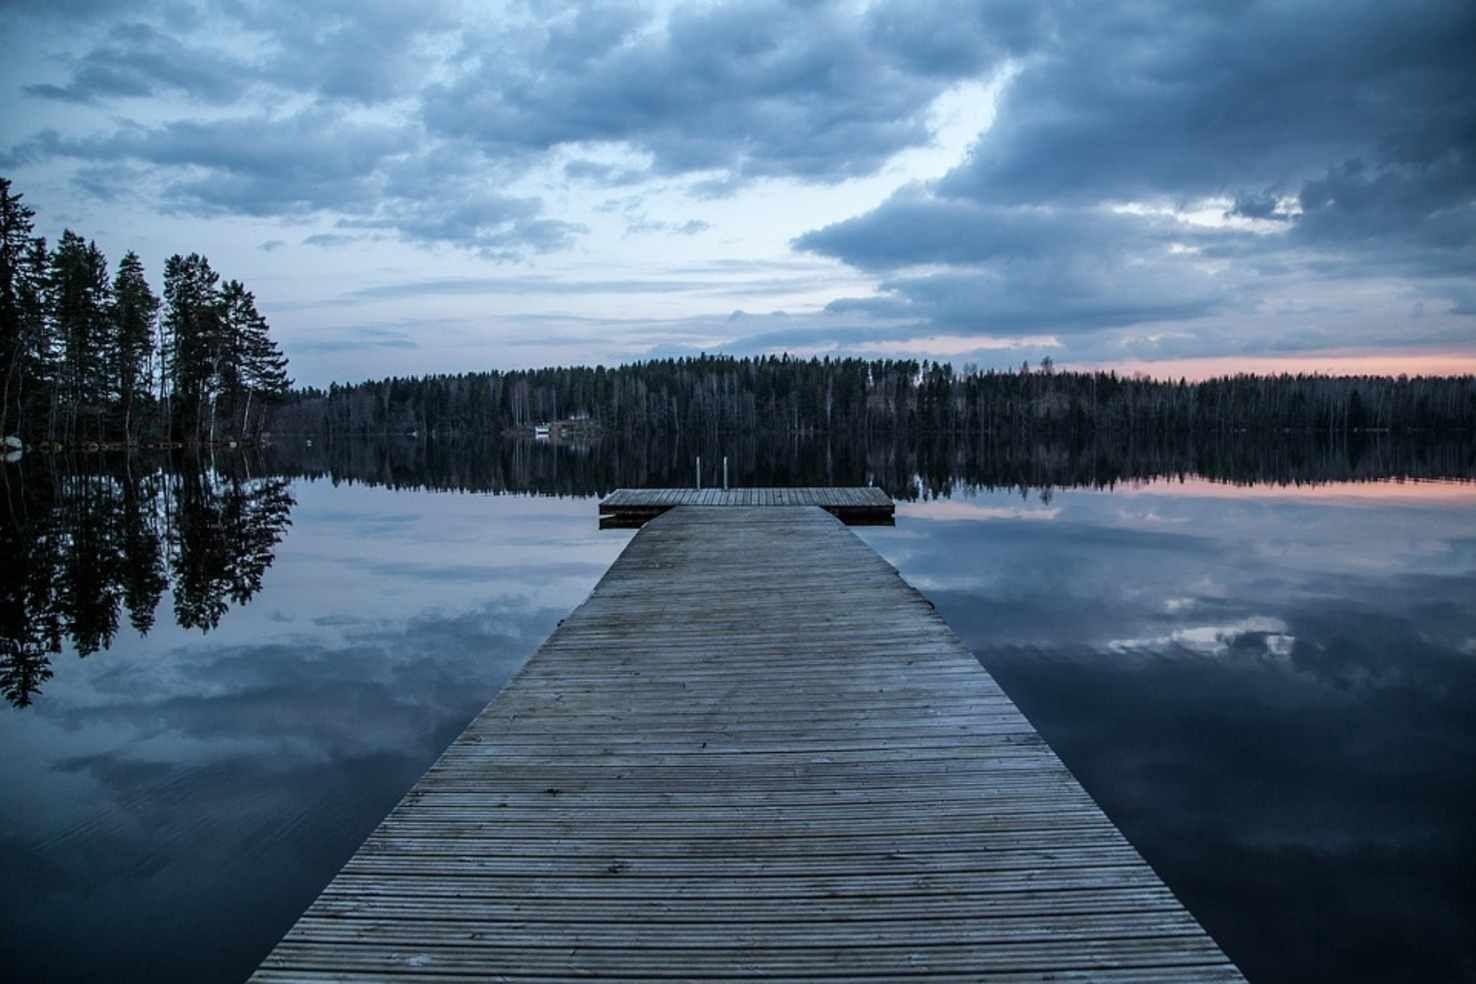 Denmark Norway Sweden Tour Package Scandinavia Holidays Lake Landscape Trip Lake Dock